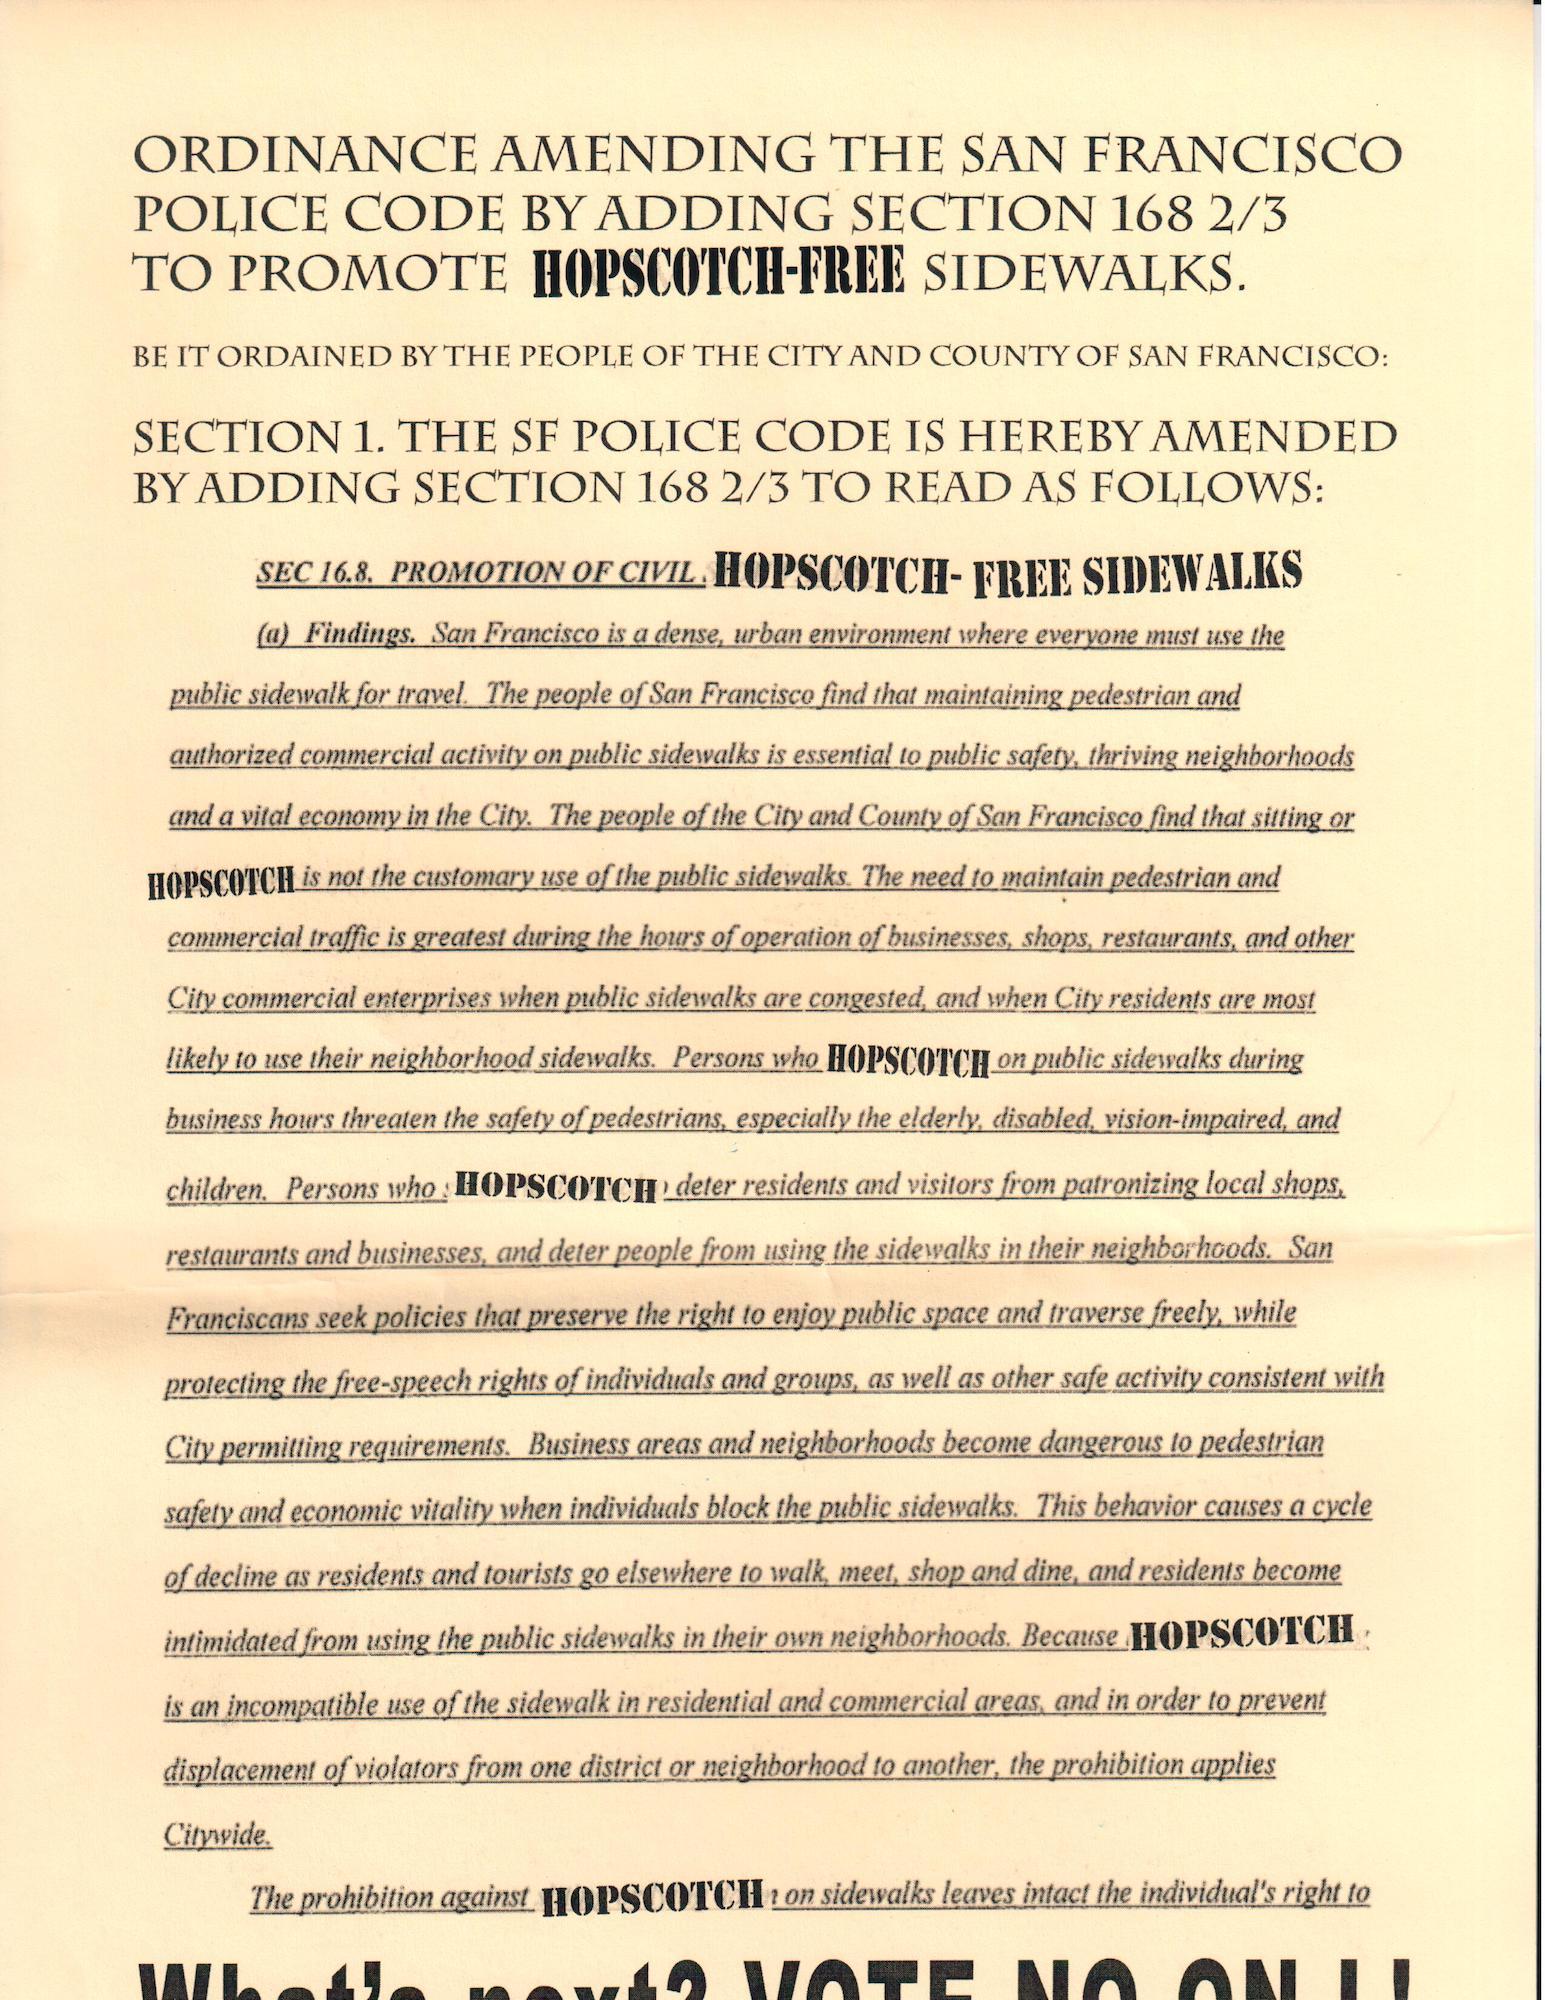 Voter's Bloc Theatre poster for HOPSCOTCH-FREE sidewalks/No on L.